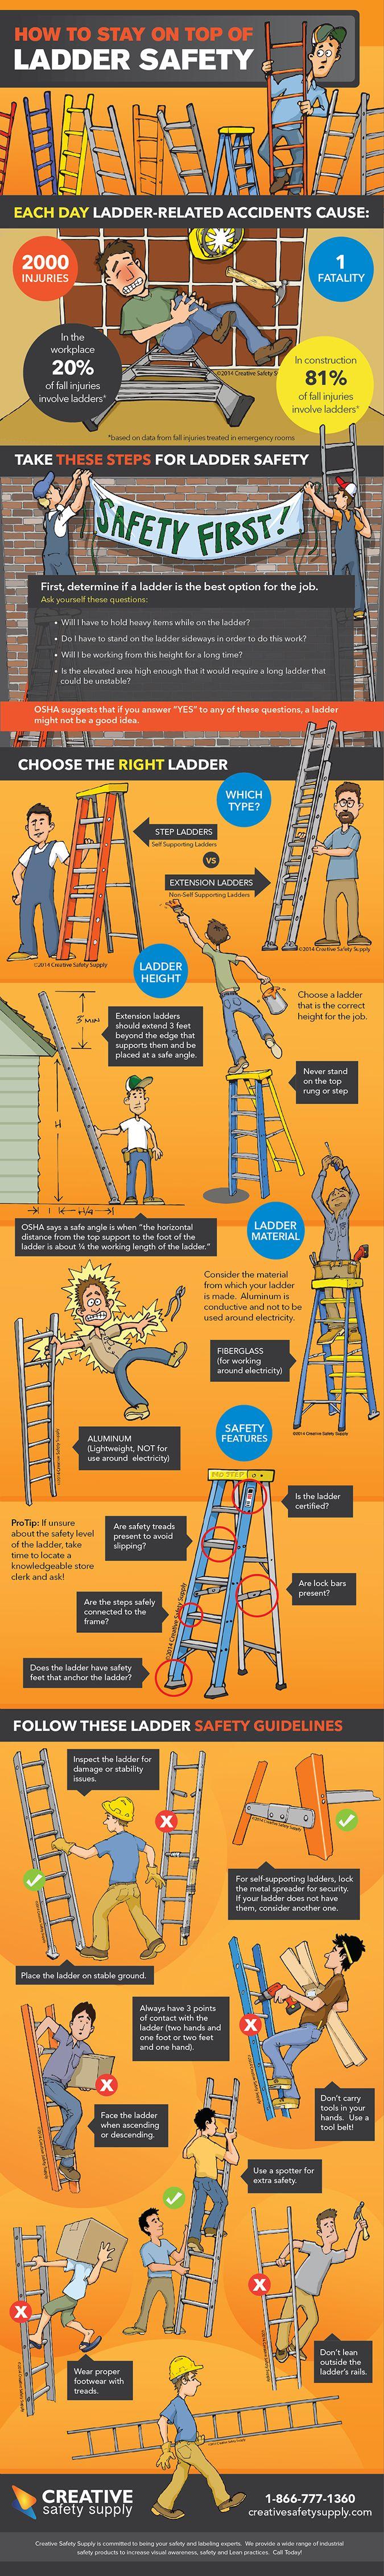 Get on top of Ladder Safety